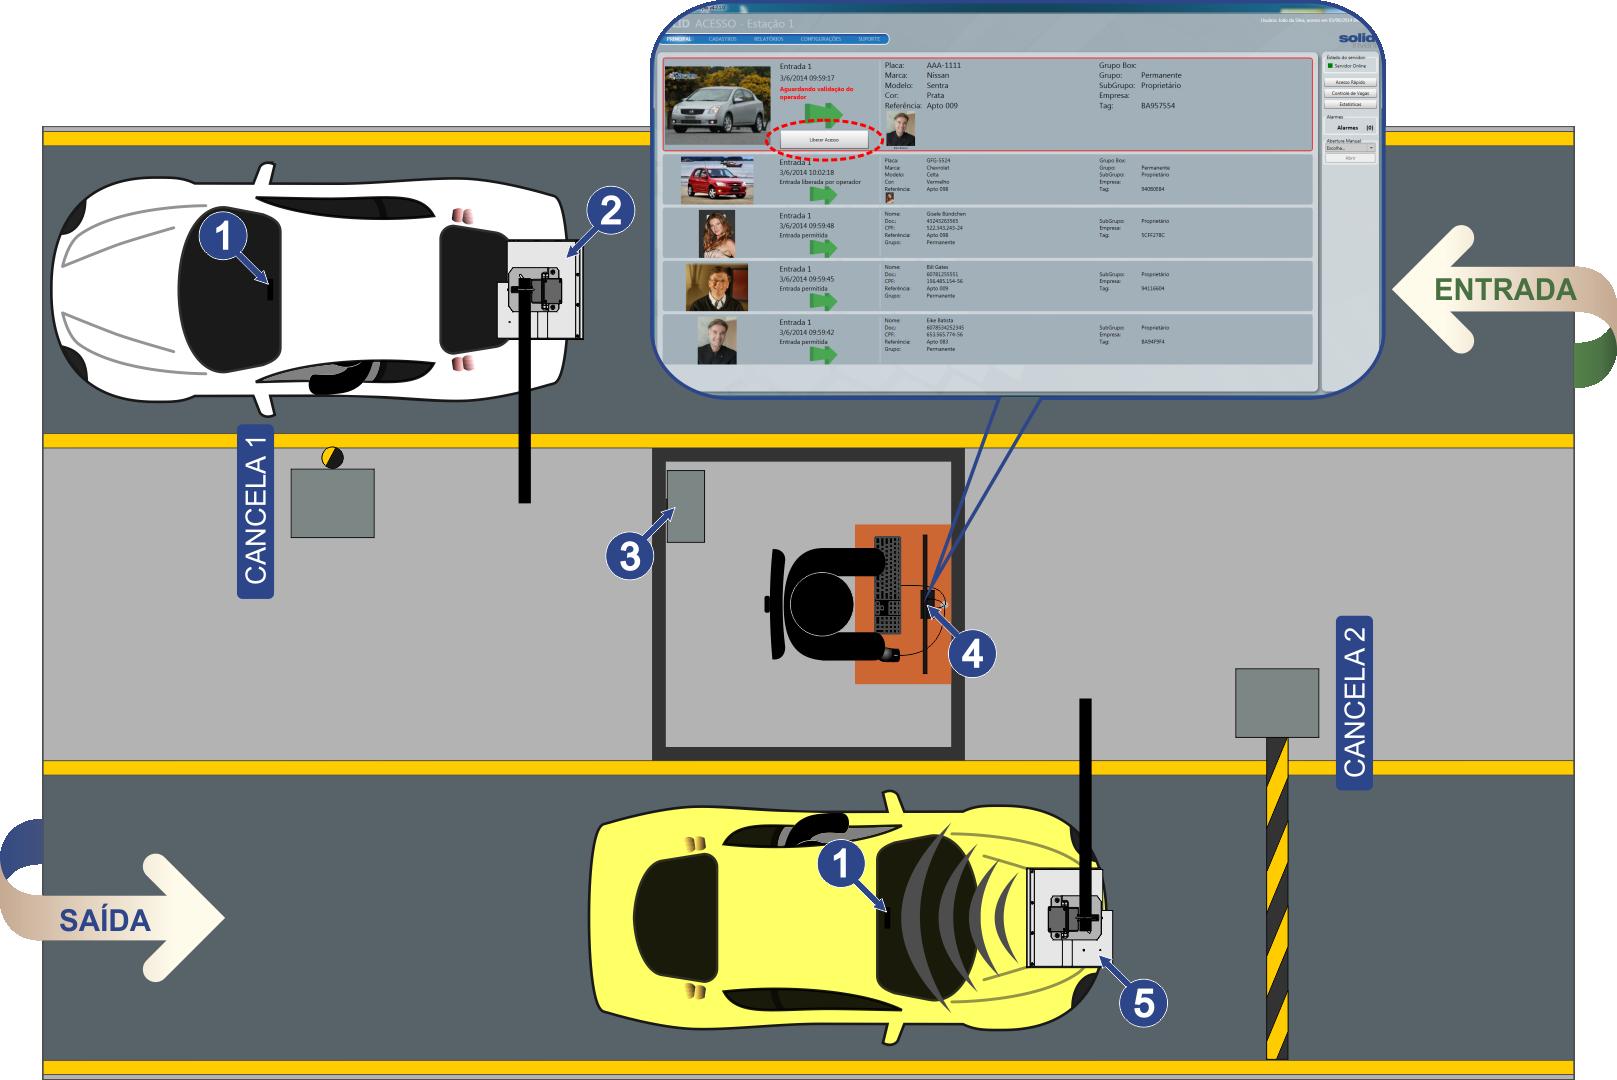 Acesso de Veículos com Duplo-check